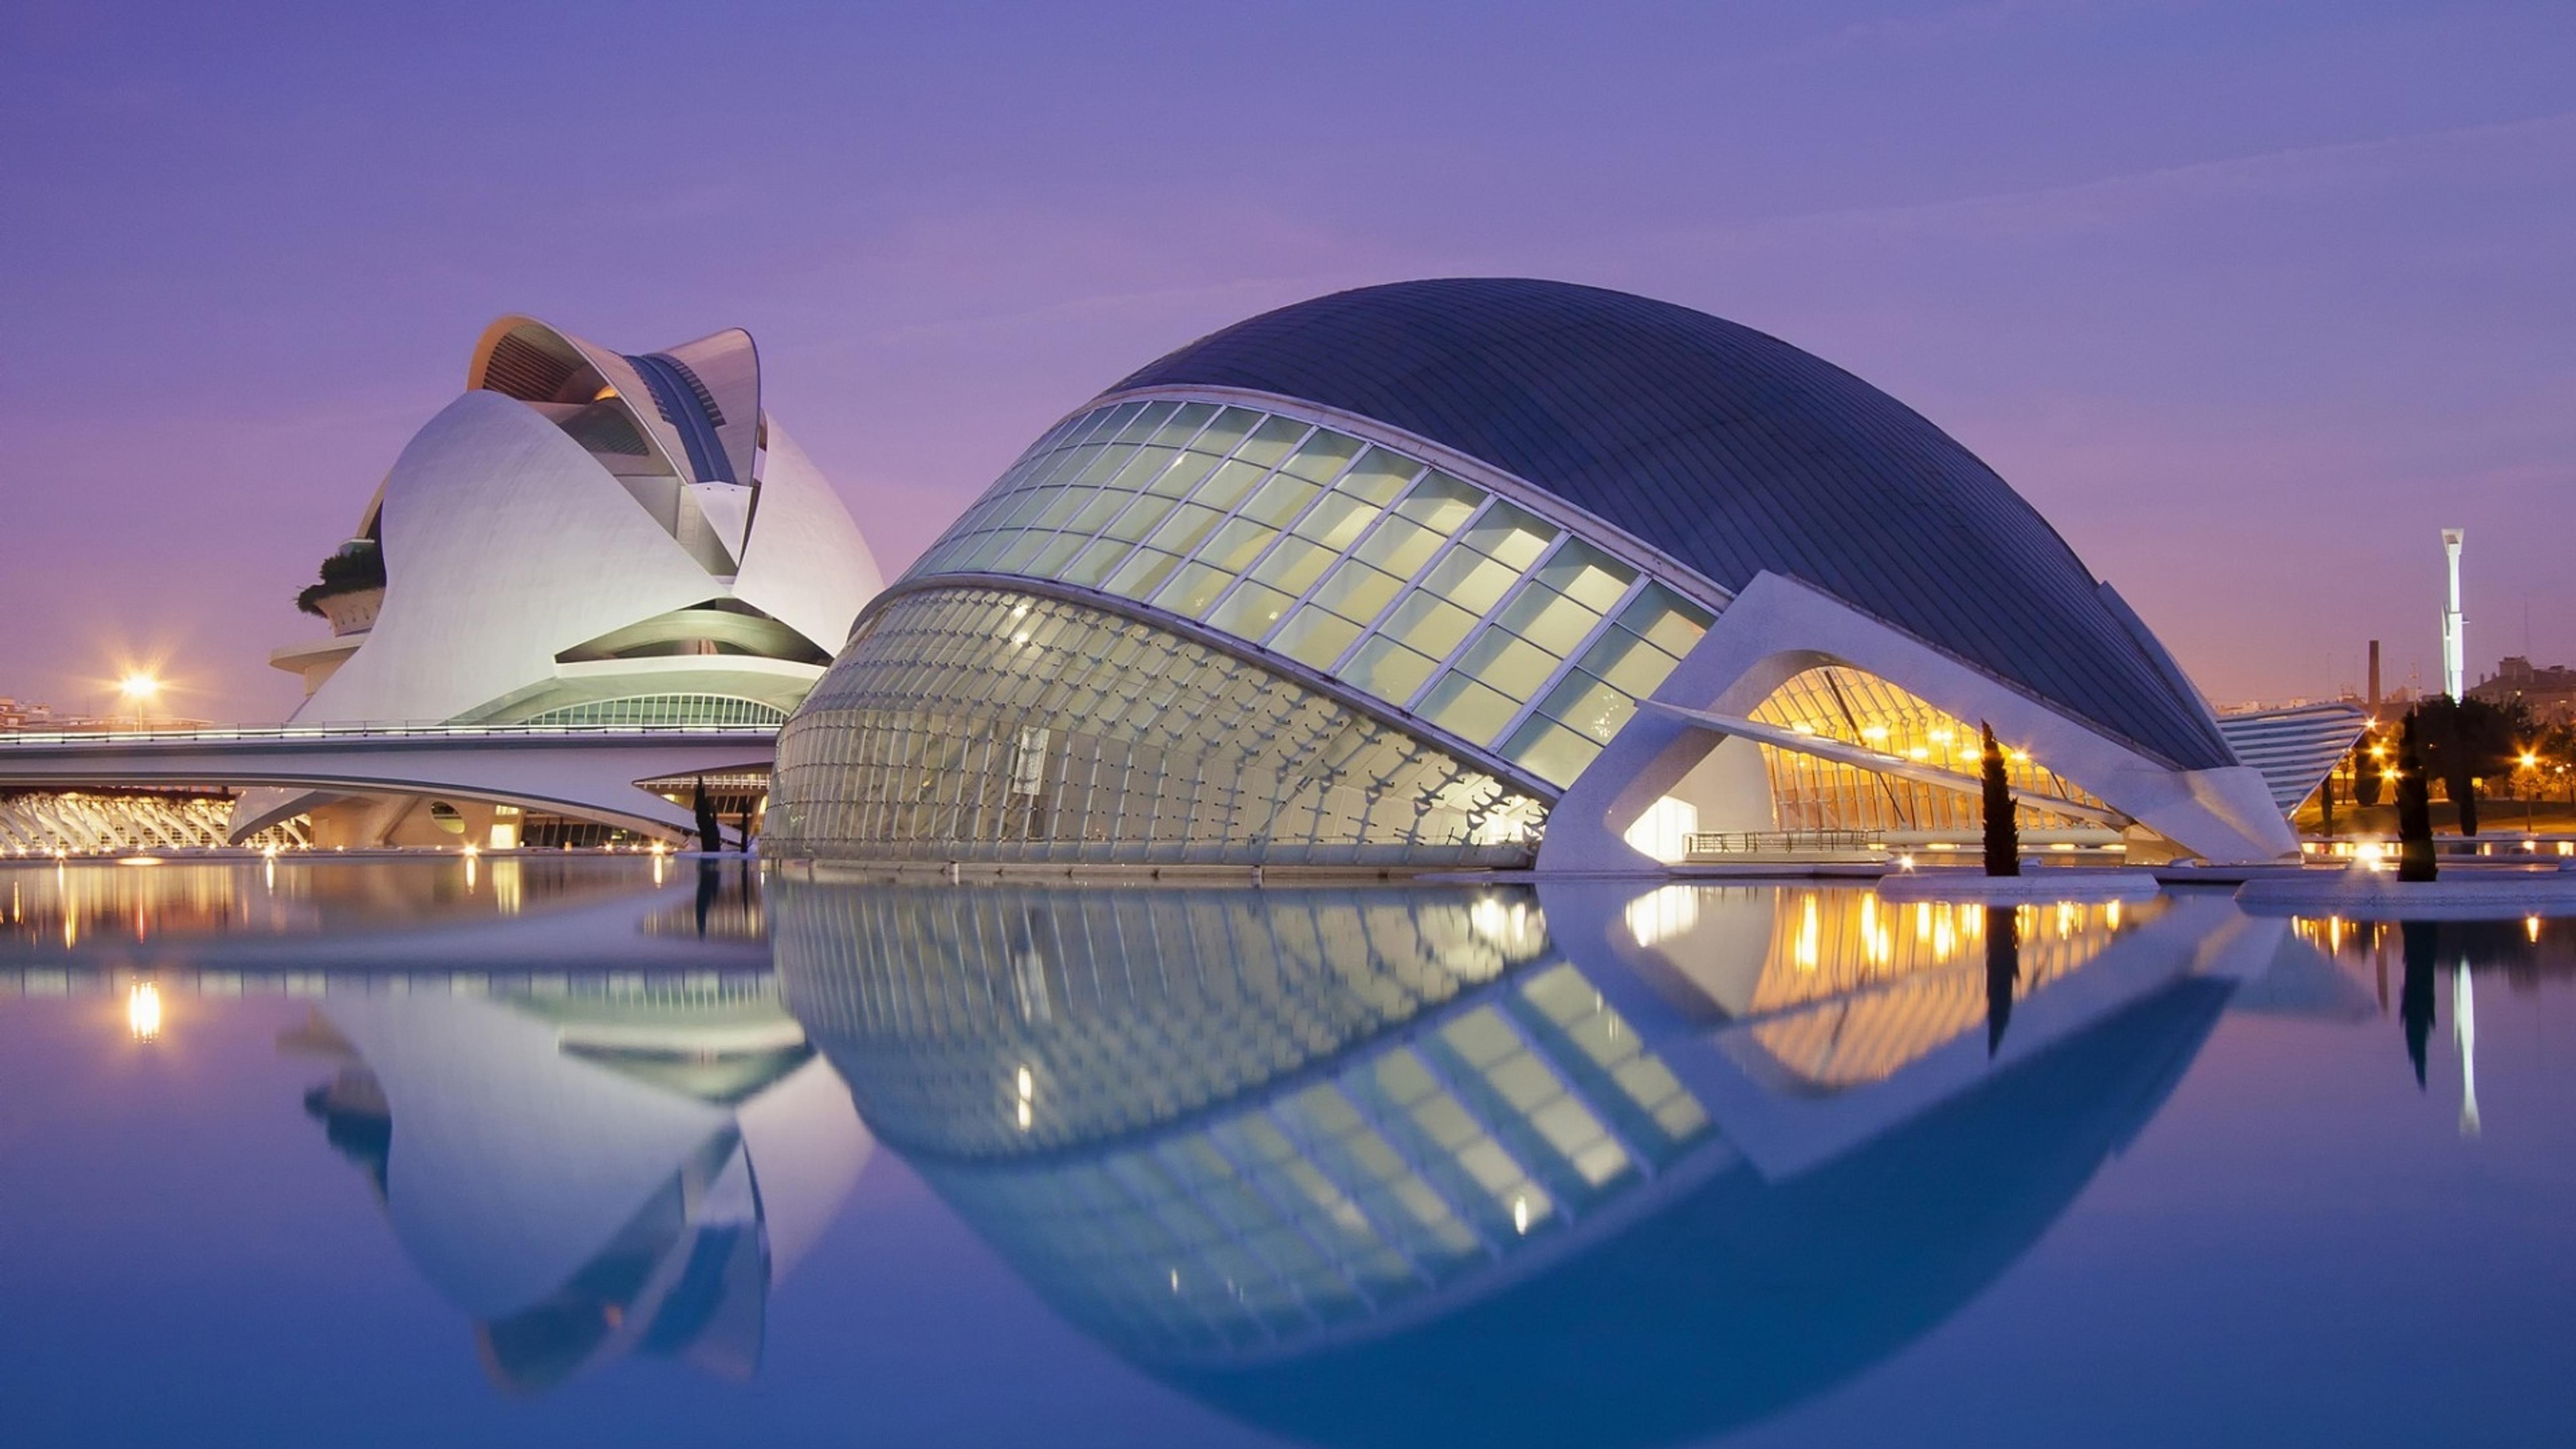 Submarino Valencia City Spain Under Purple Sky Wallpaper